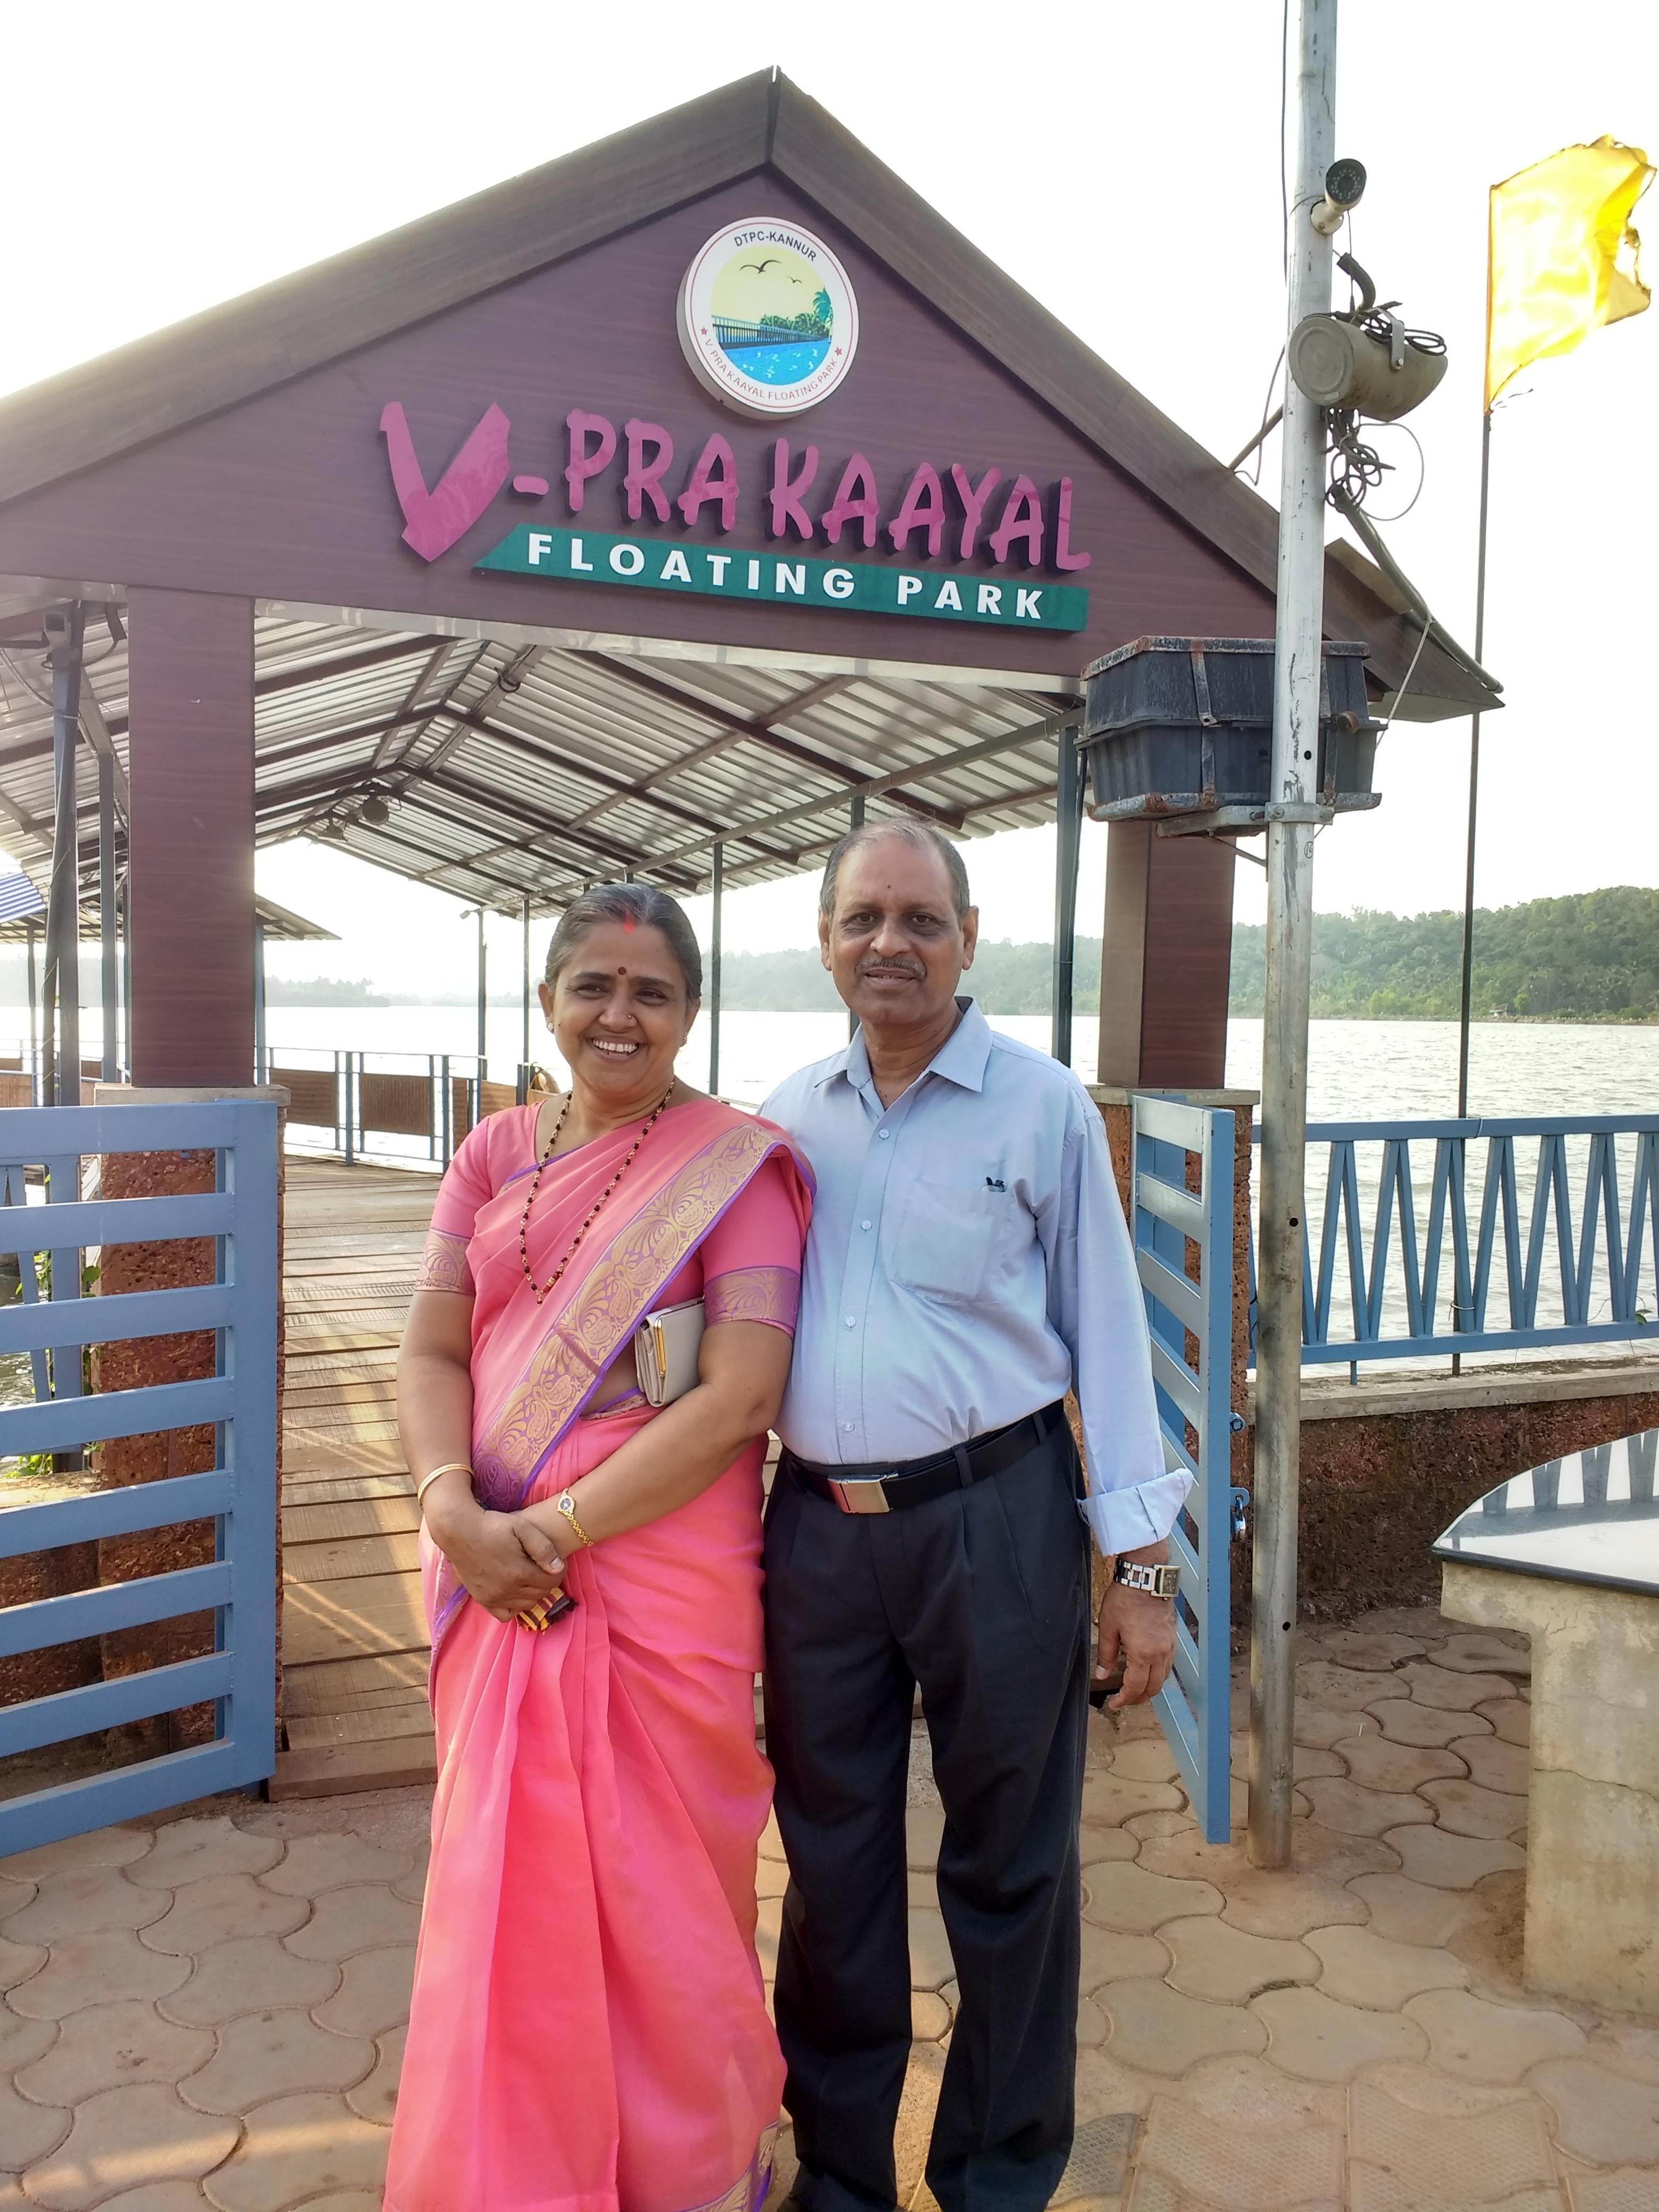 Maya Bhat's parents